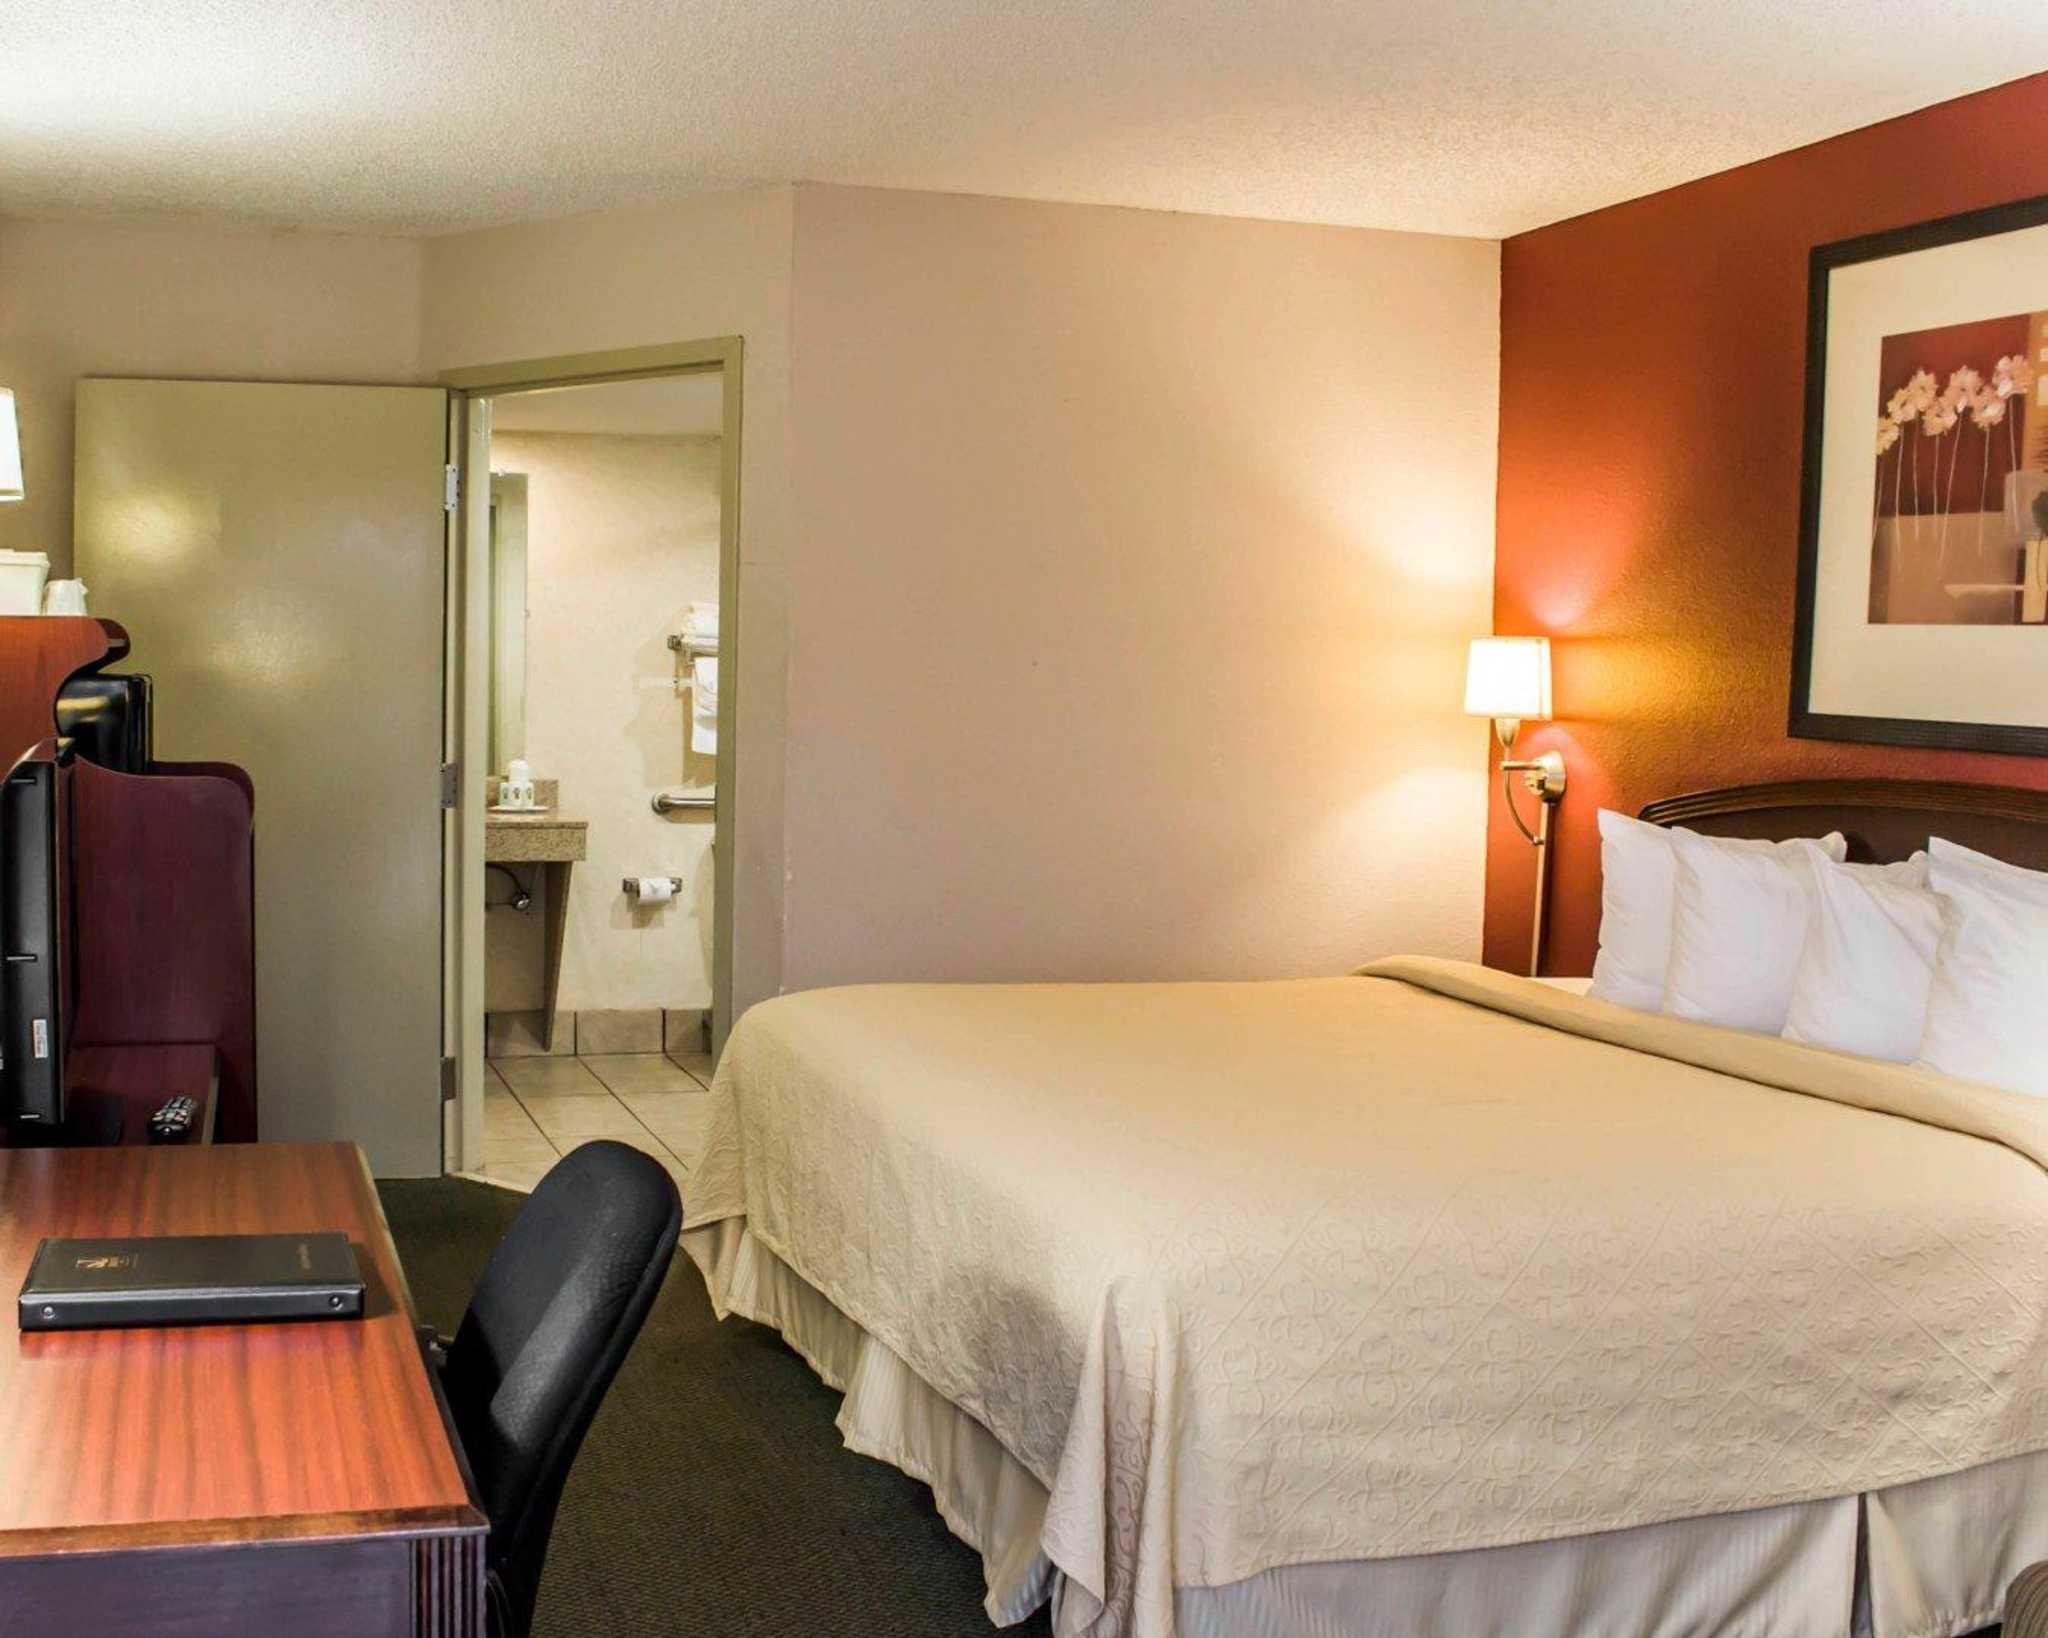 Quality Inn Roanoke near Lake Gaston image 10